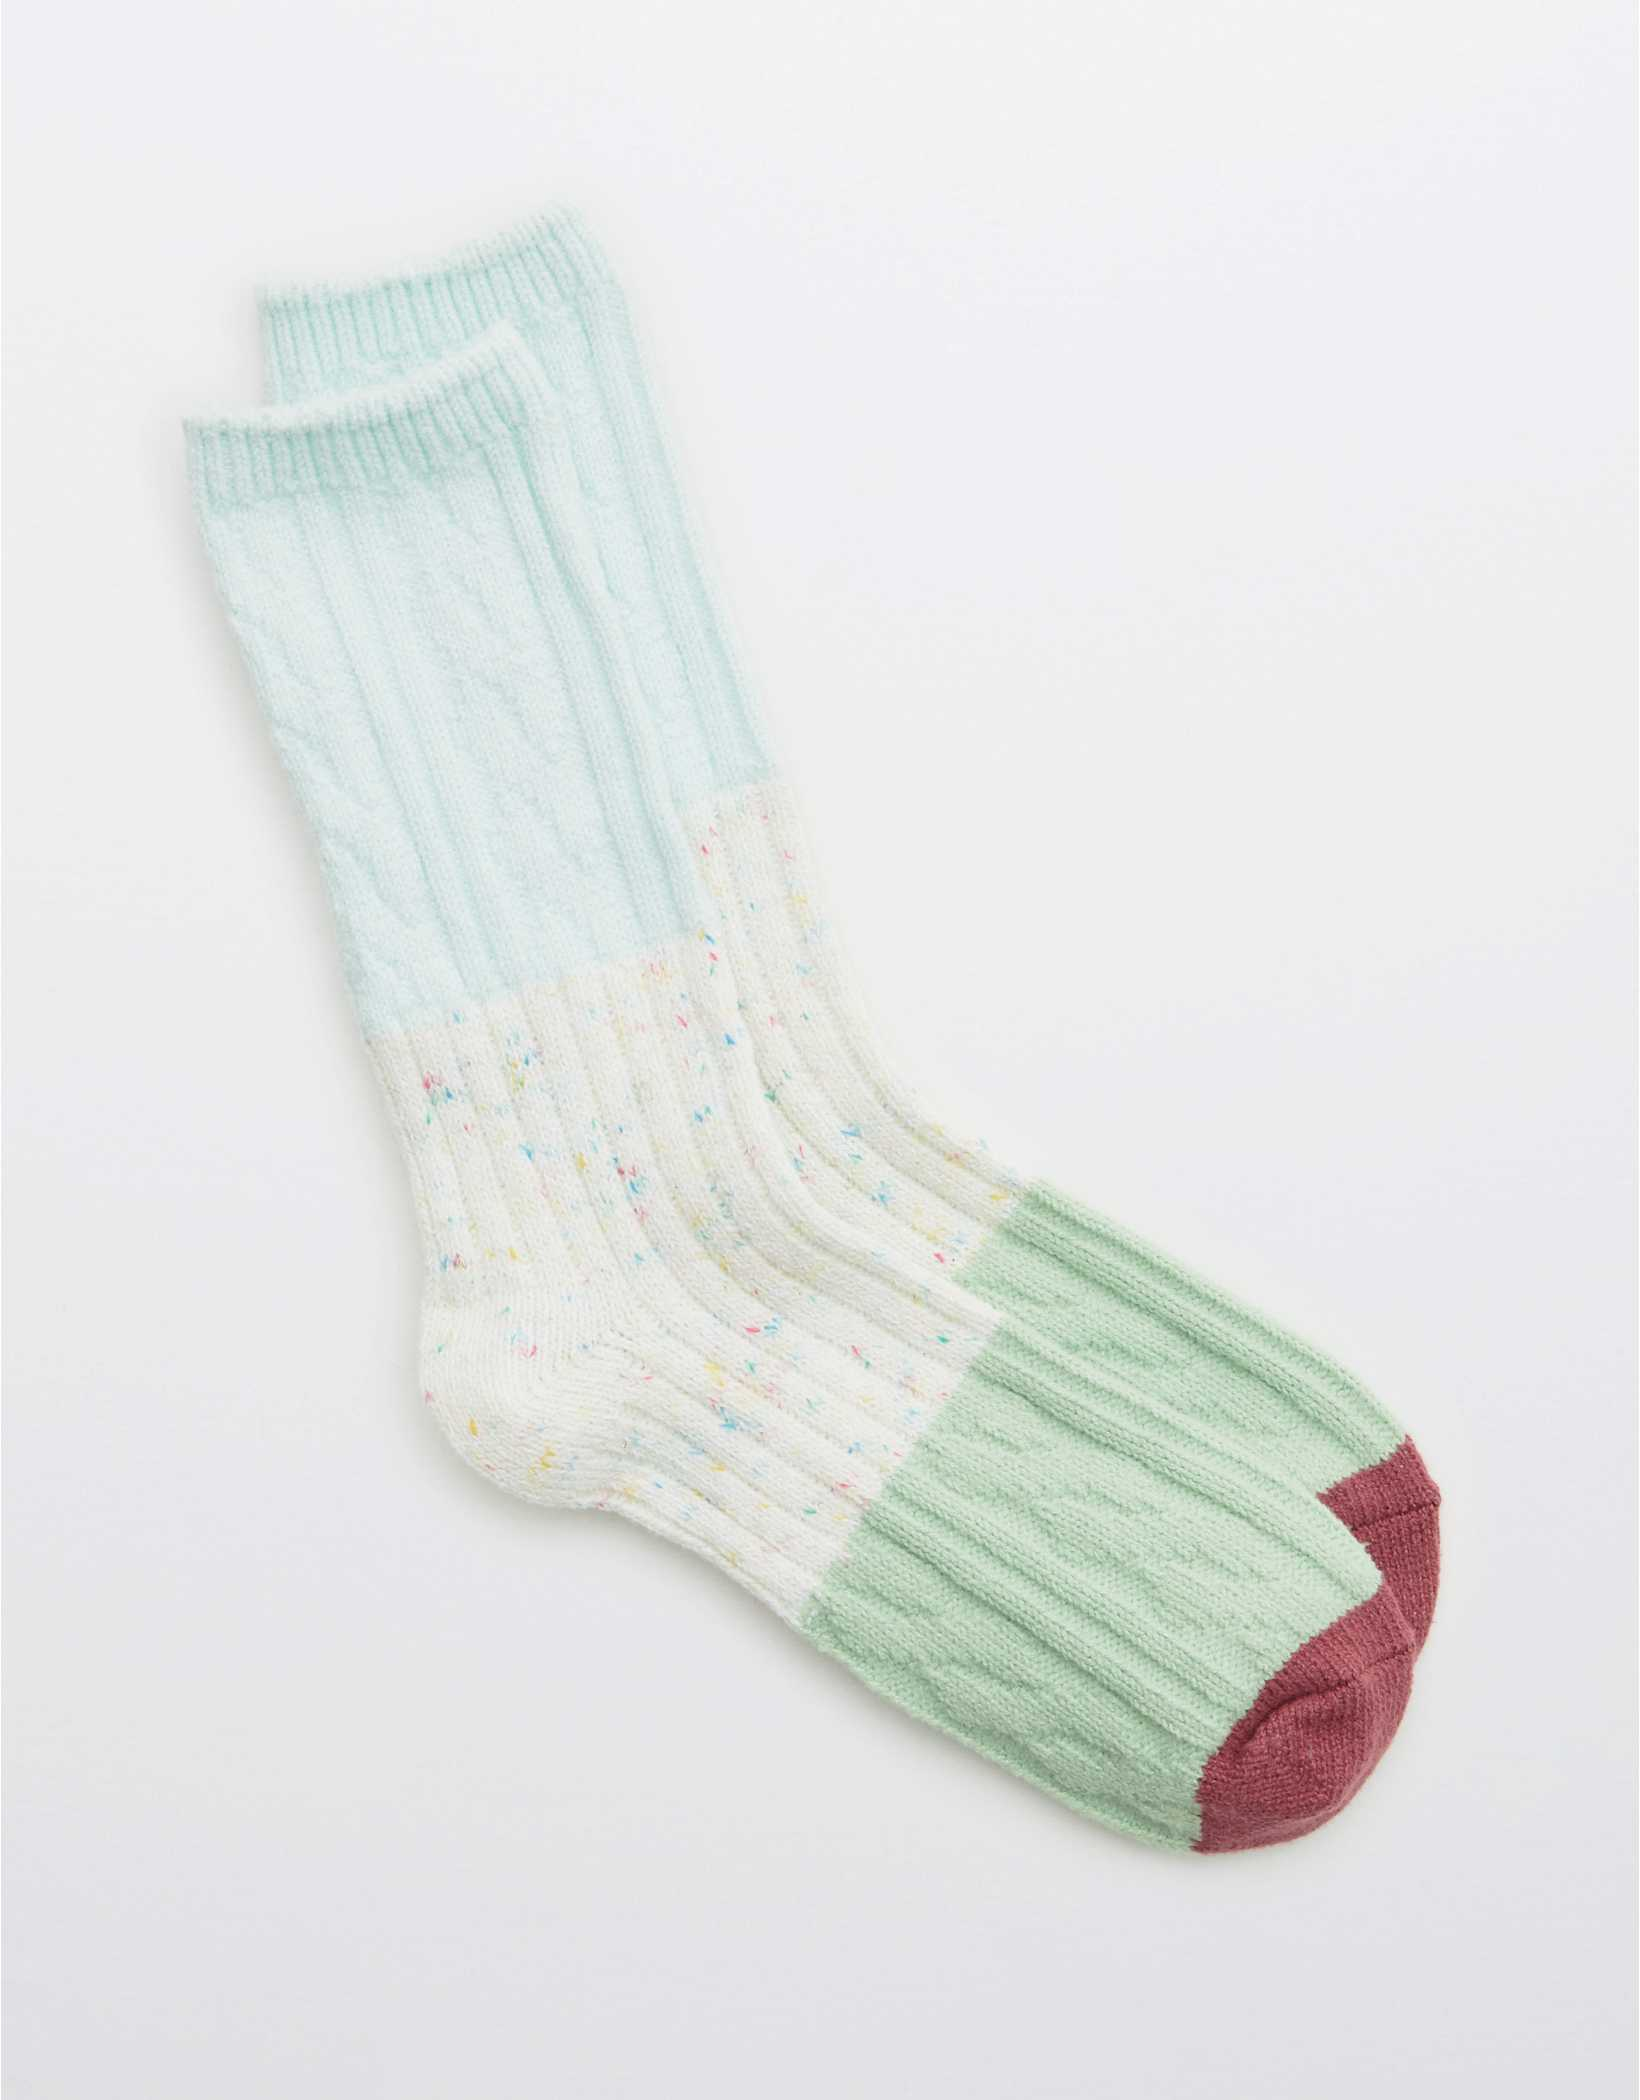 Aerie Colorblock Crew Socks